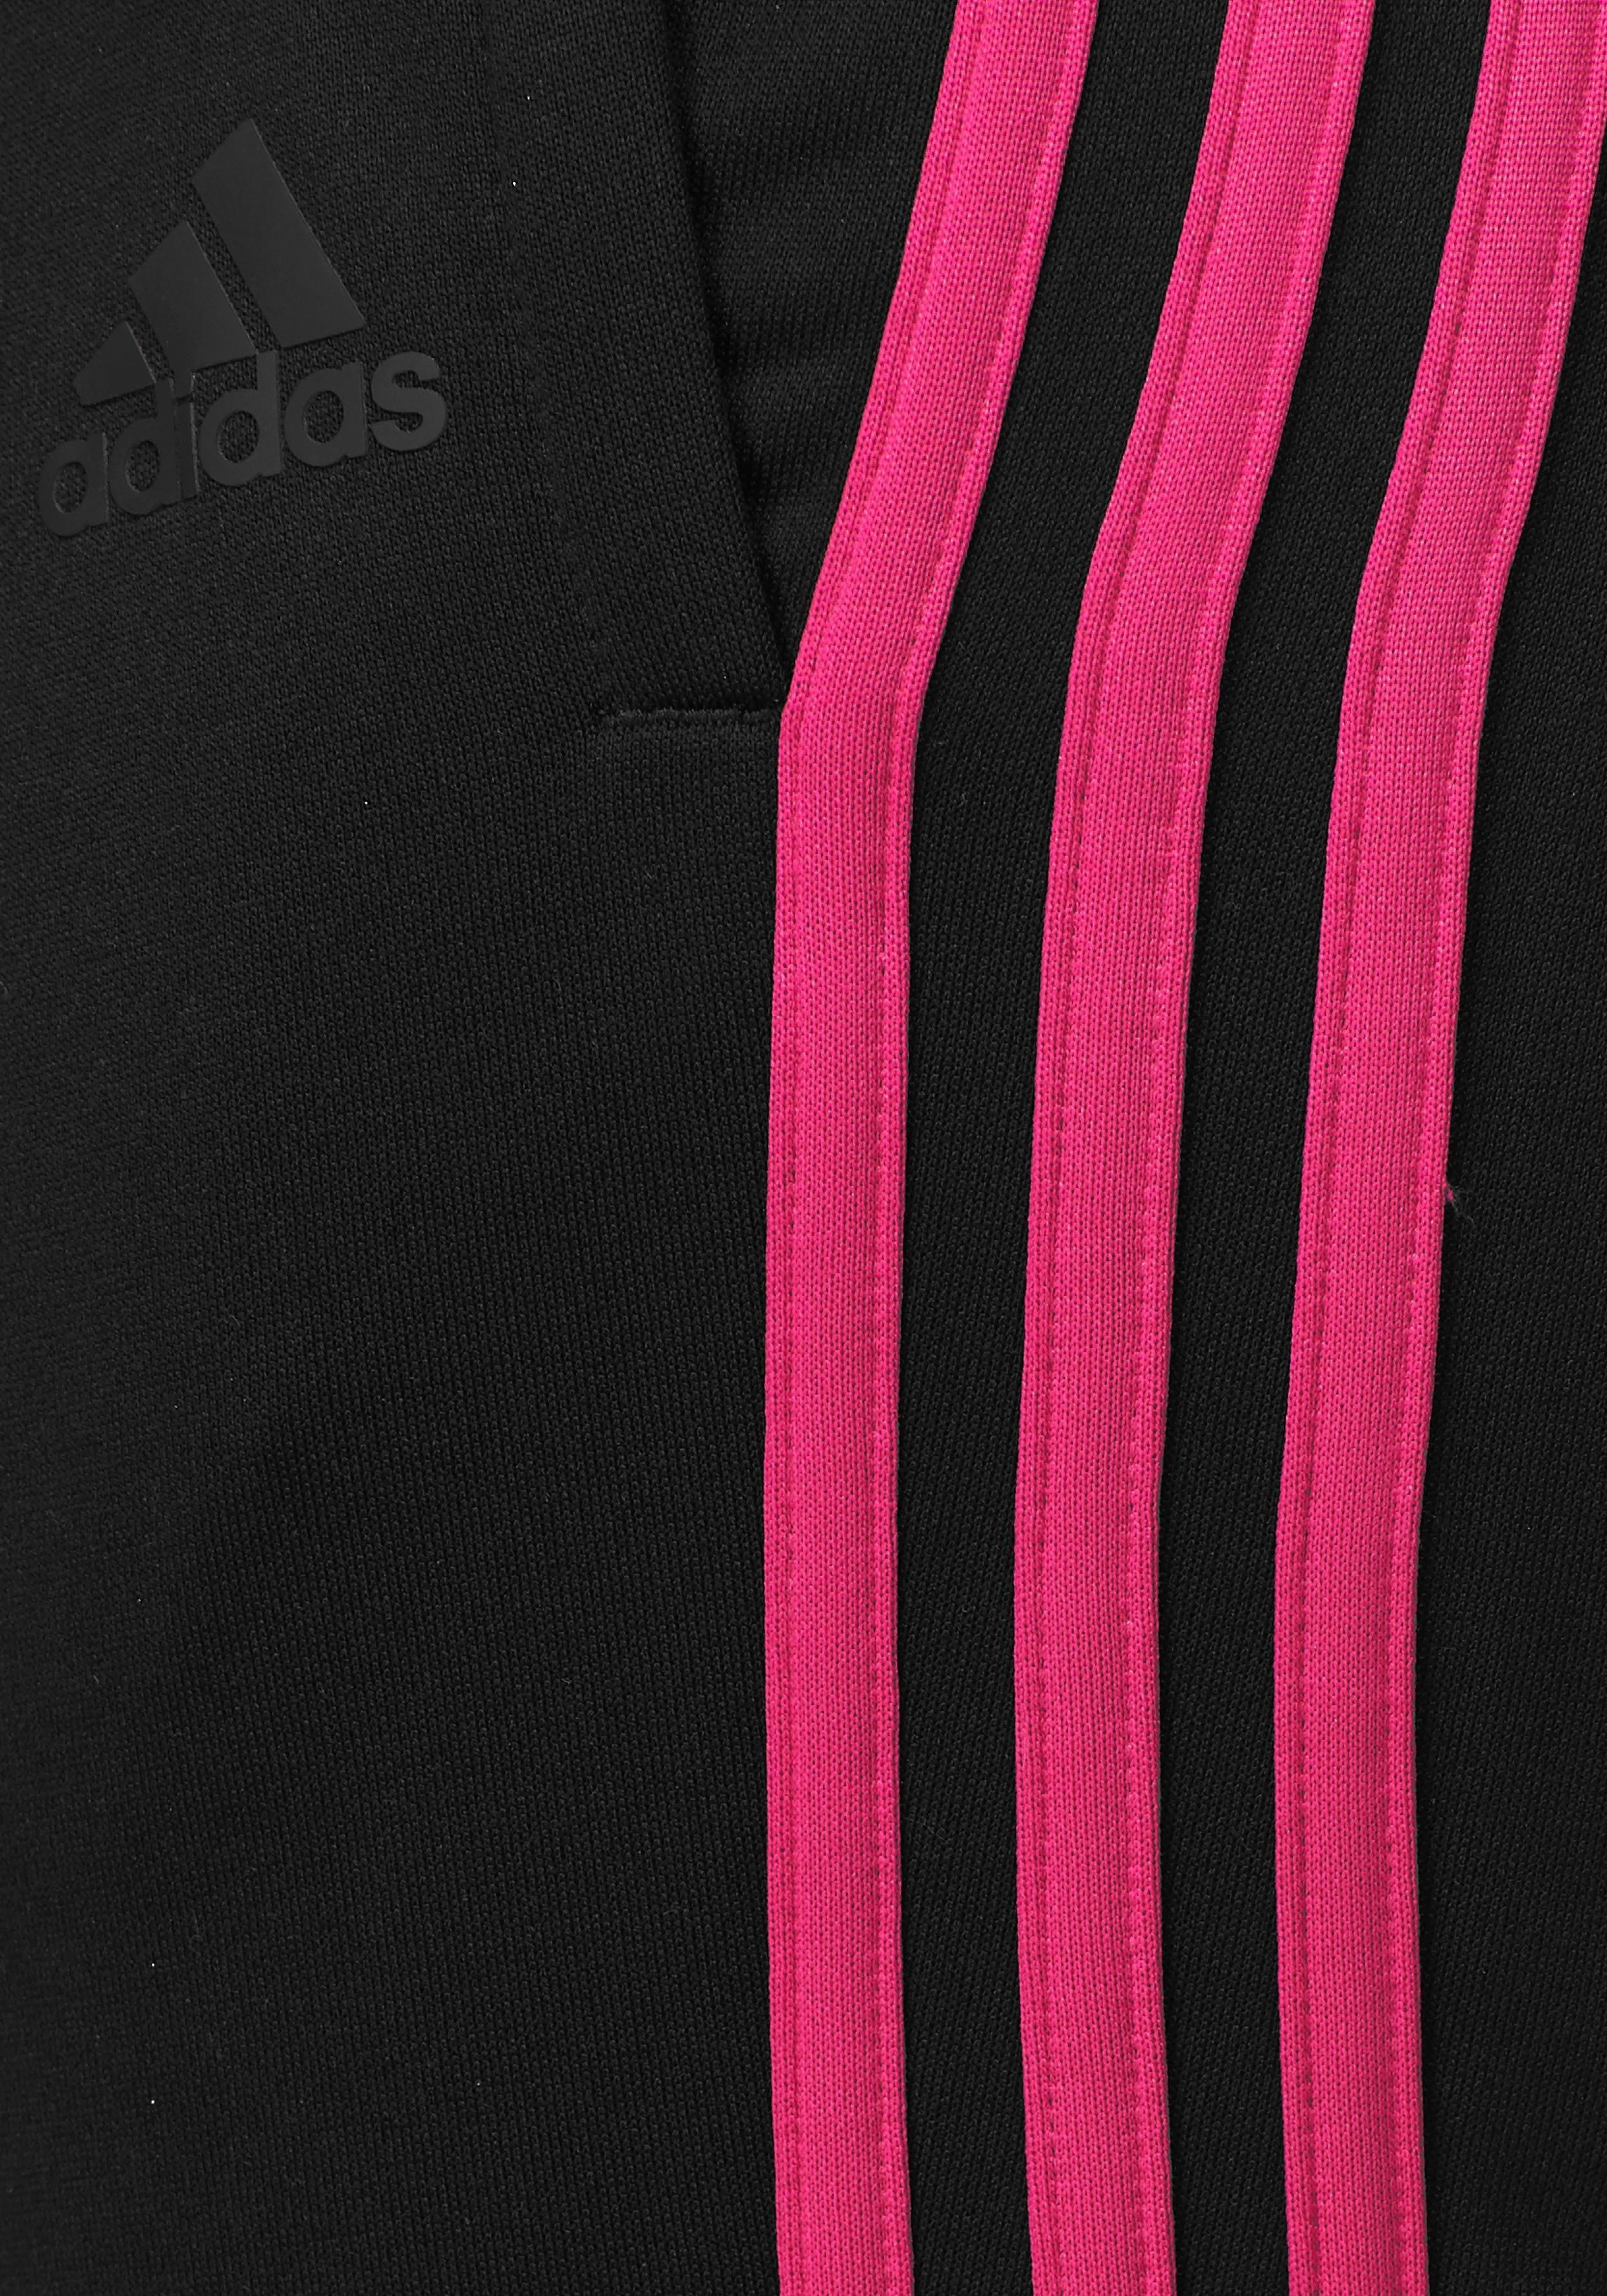 Cosyset2 Bij deligBestellen Adidas Tracksuit Performance Trainingspakwomen Polyester QdCshrtx